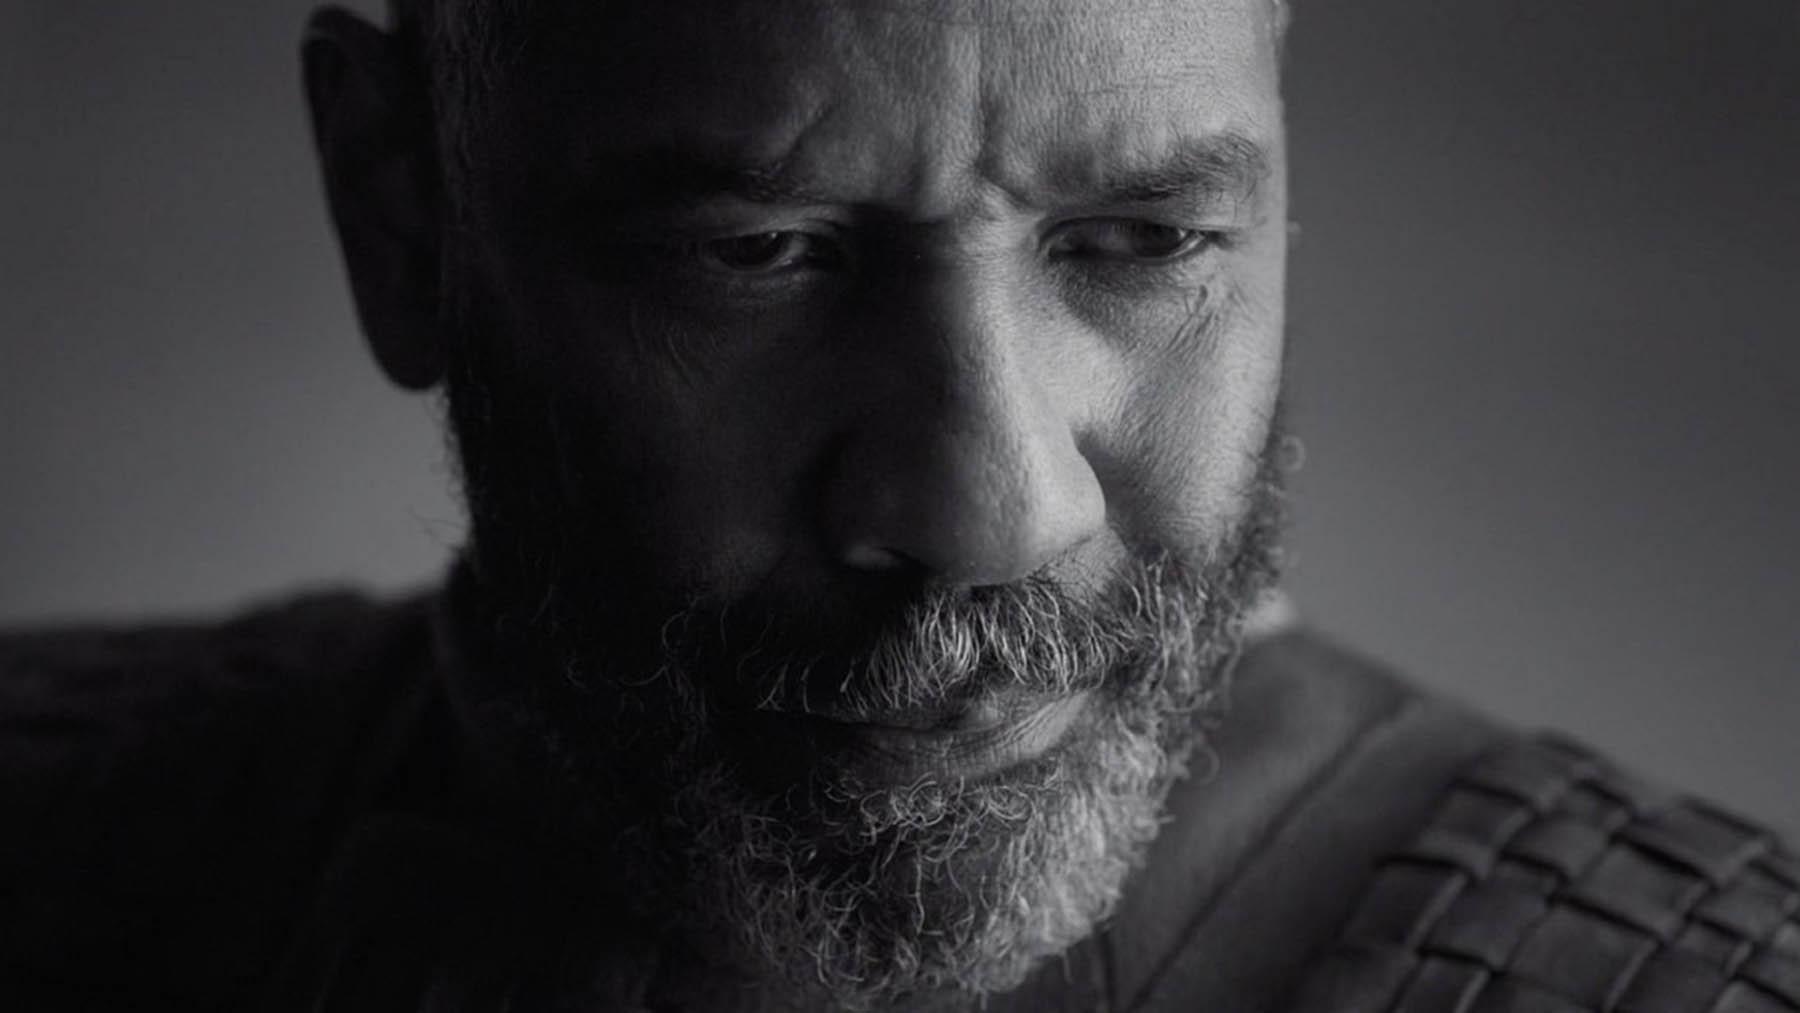 «The Tragedy of Macbeth» (Apple/A24)